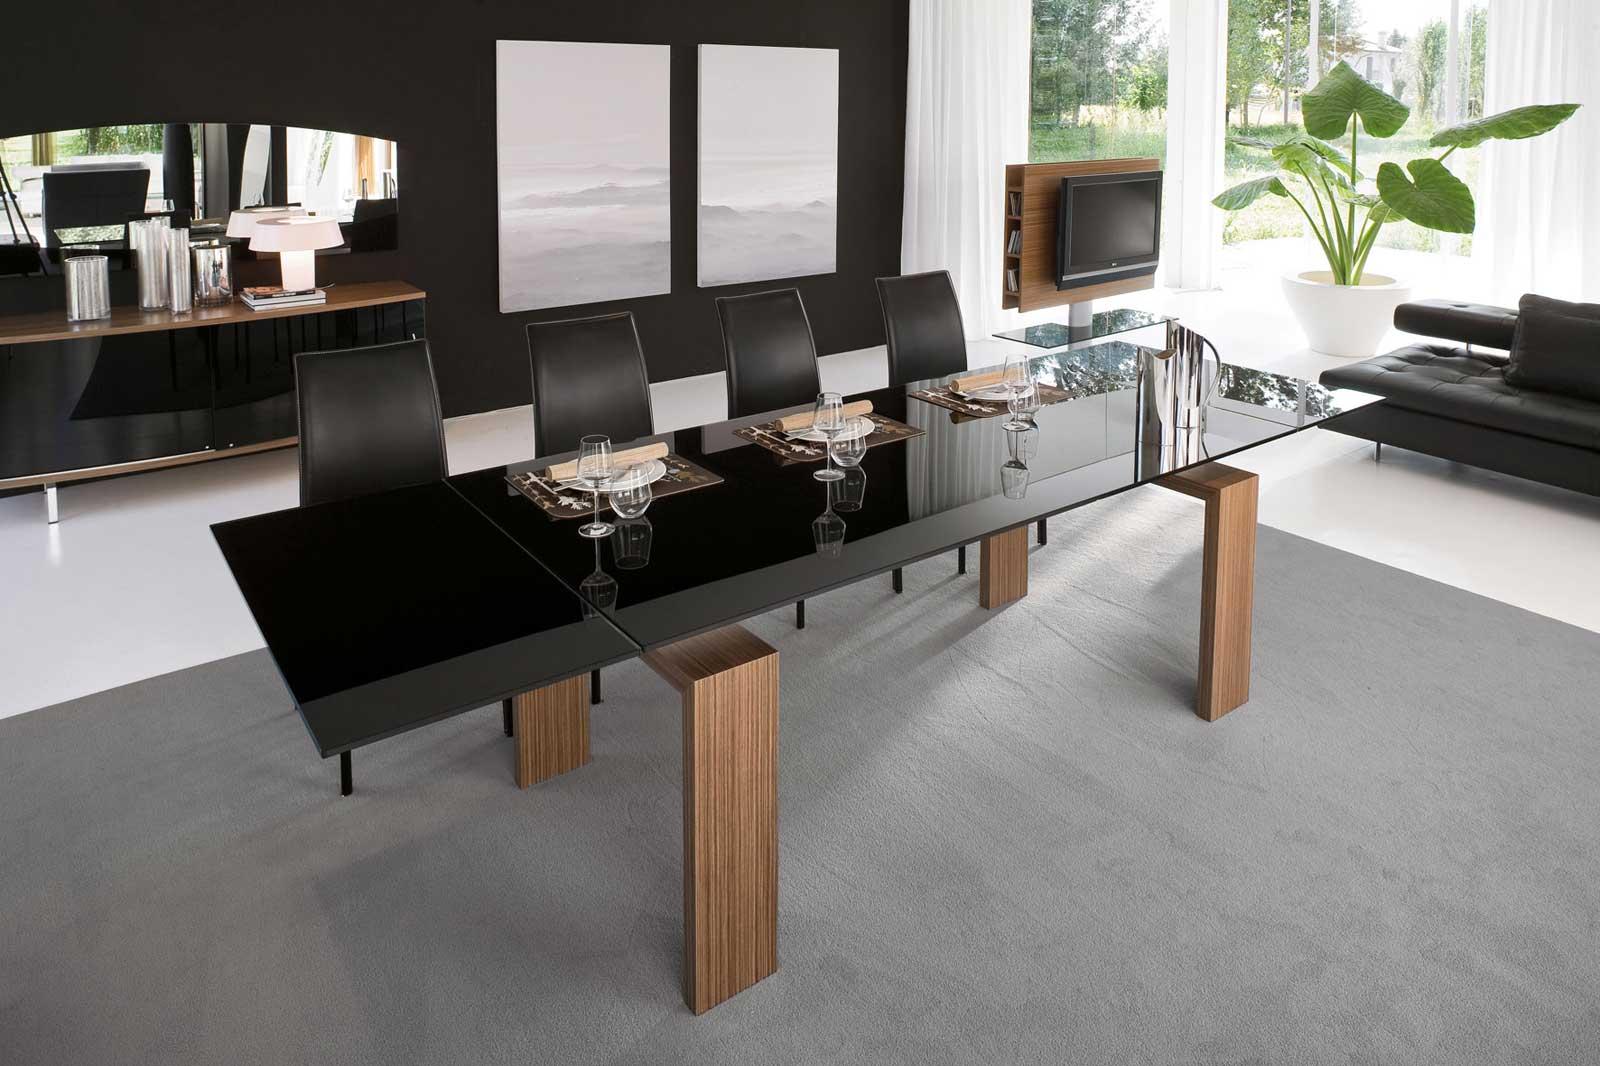 Black Dining Room Furniture (Image 3 of 11)